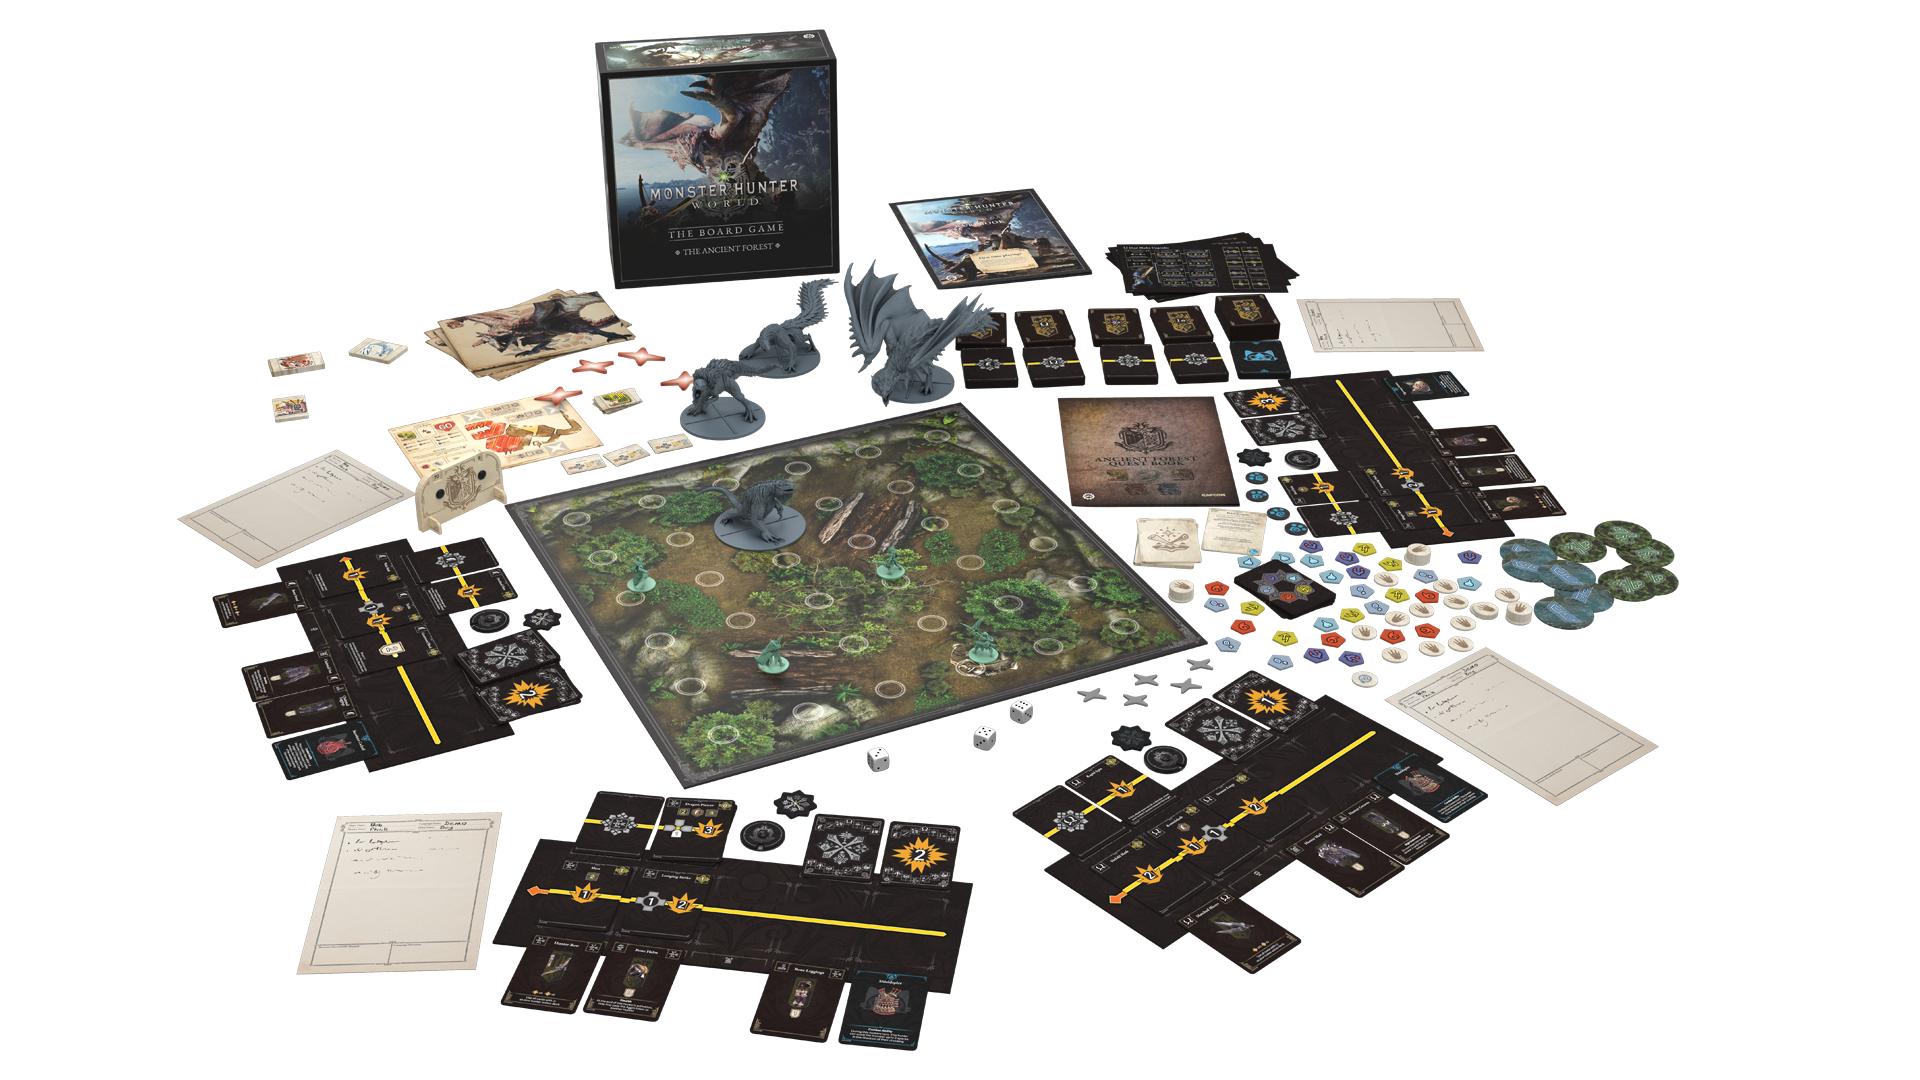 monster hunter world box spill fixed.png